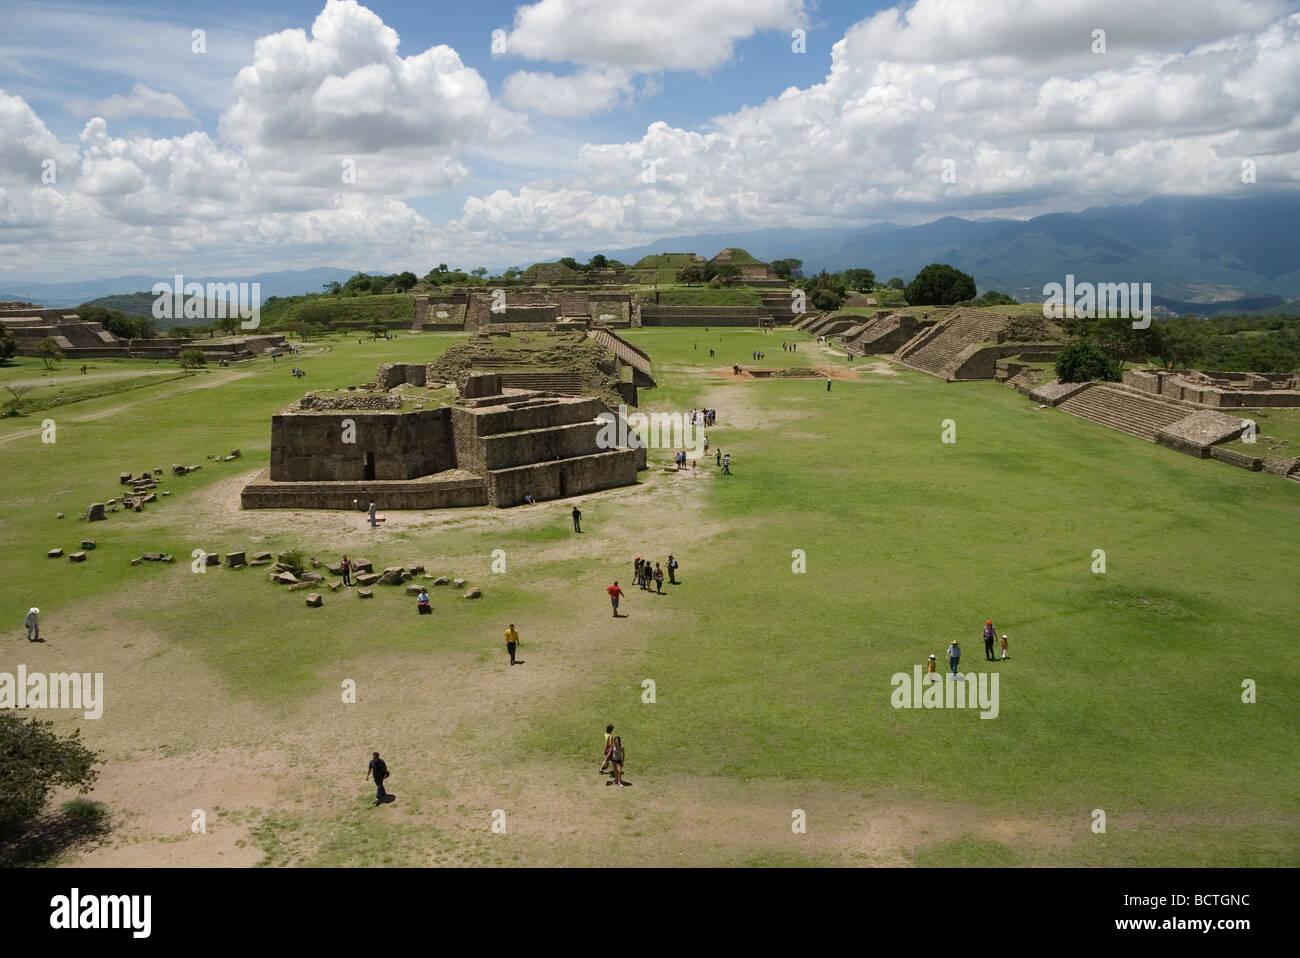 Monte Alban Ruin Site Oaxaca, Mexico, 500 BC-750 AD the oldest stone city in Mexico, Zapotec builders, stone pyramidal Stock Photo